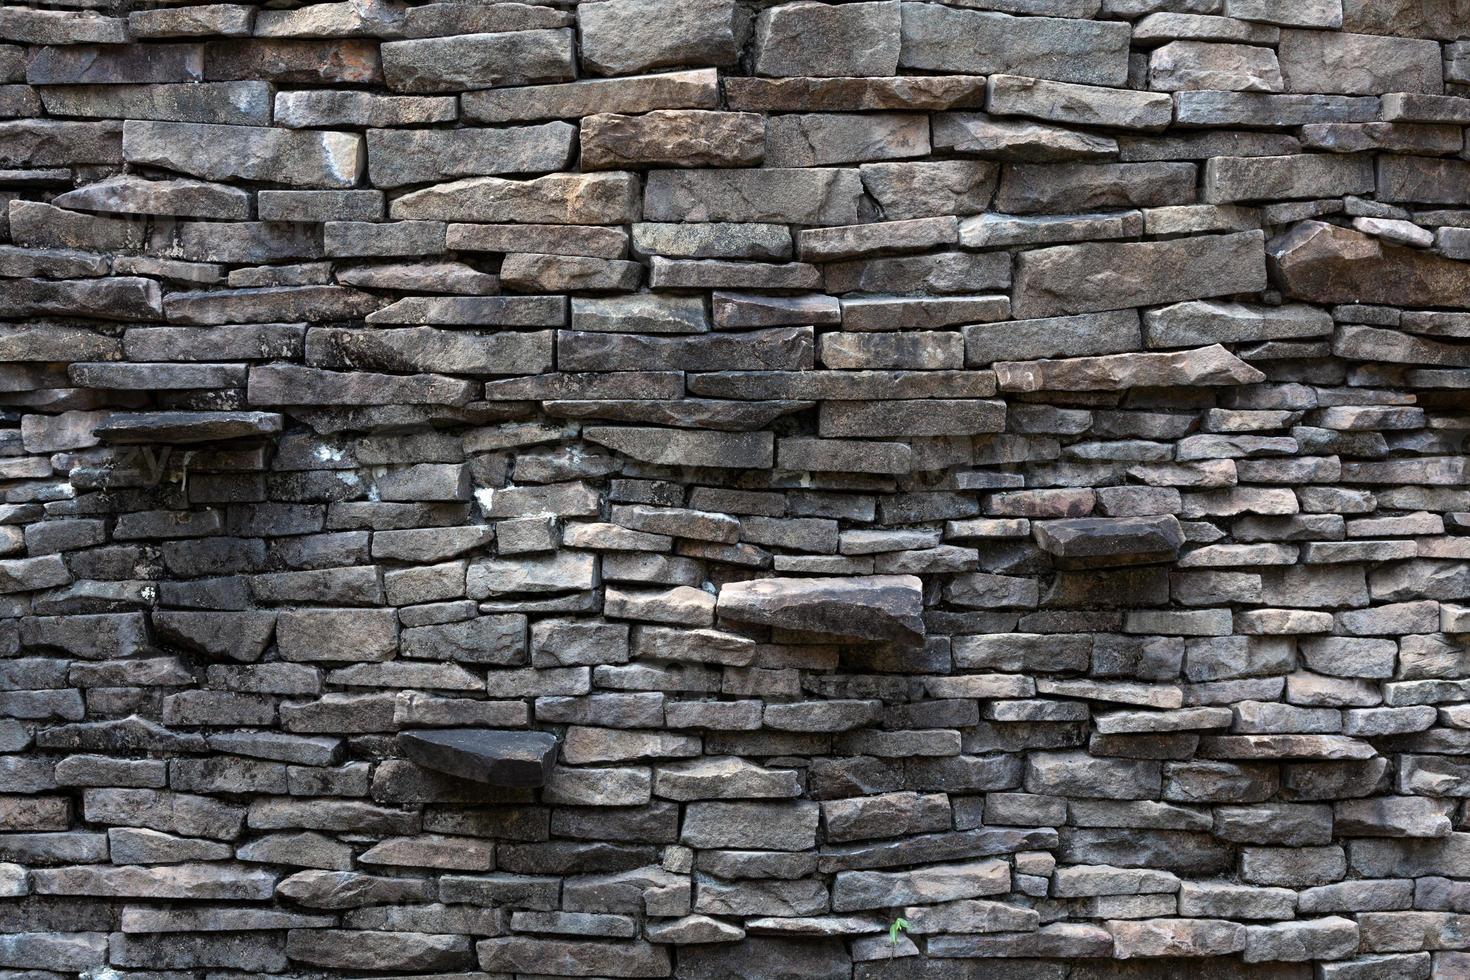 losa de roca sucia foto